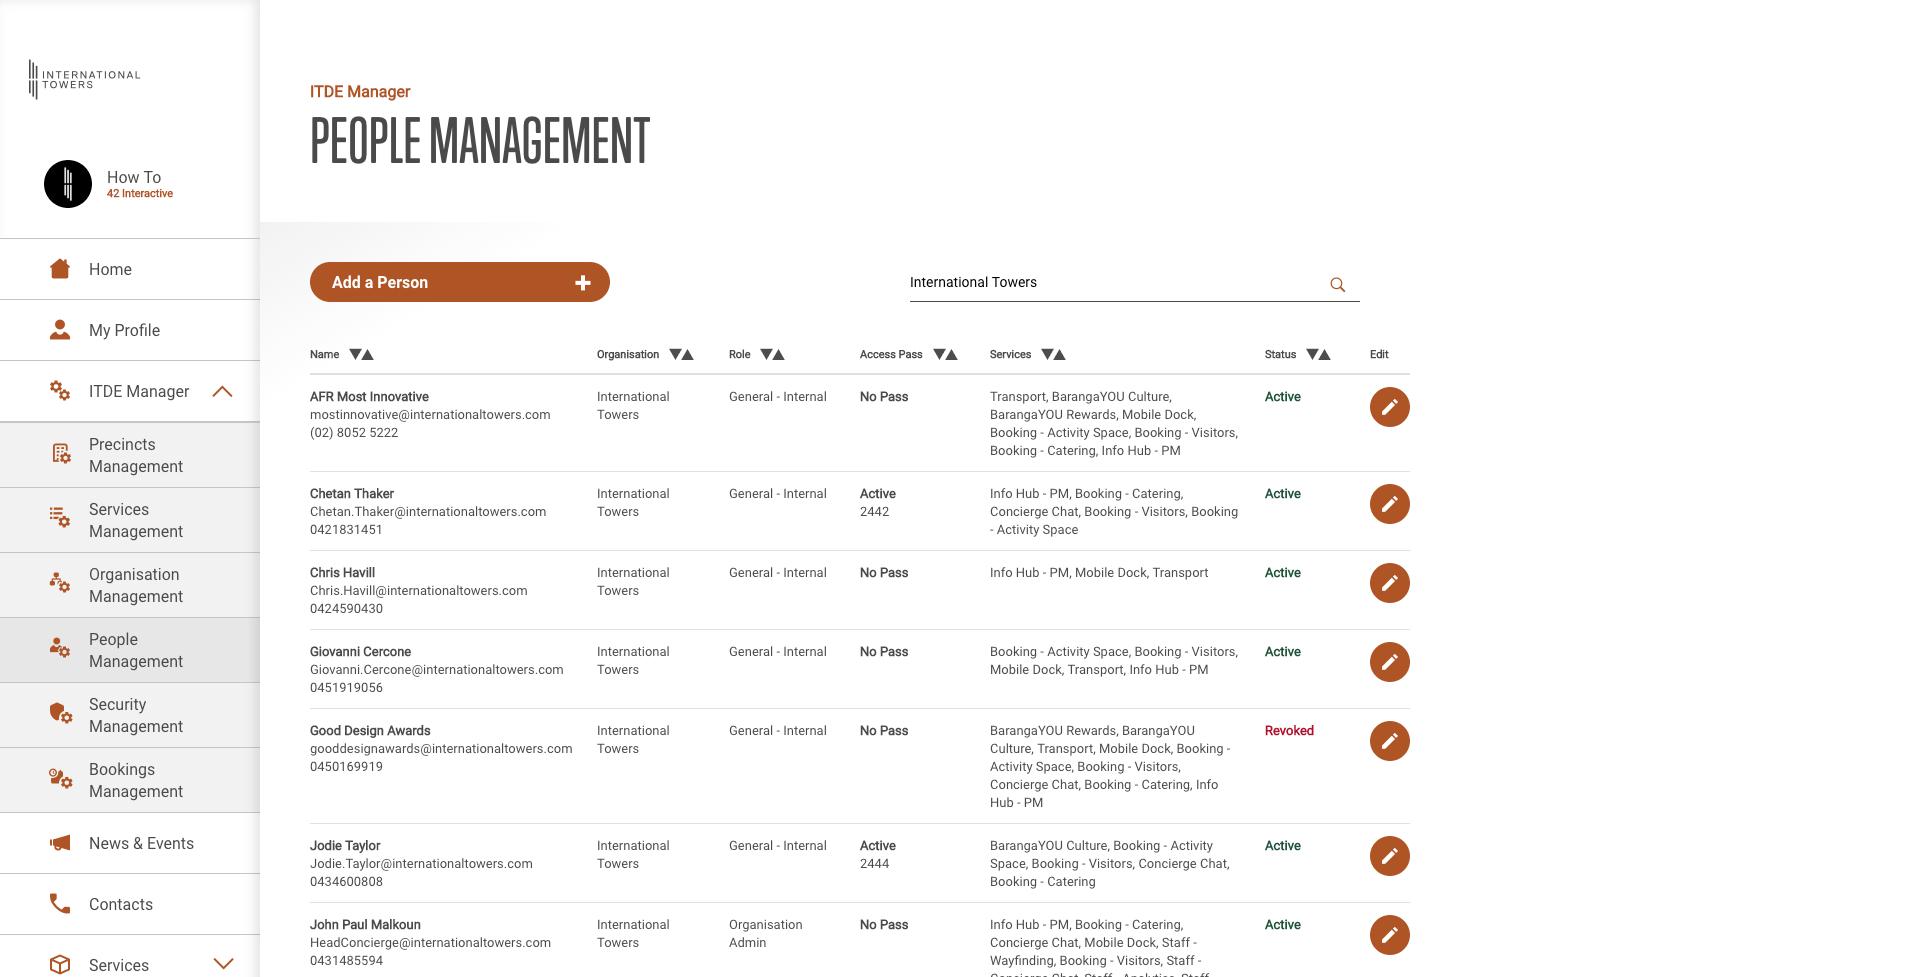 ITDE-peoplemanagement-list